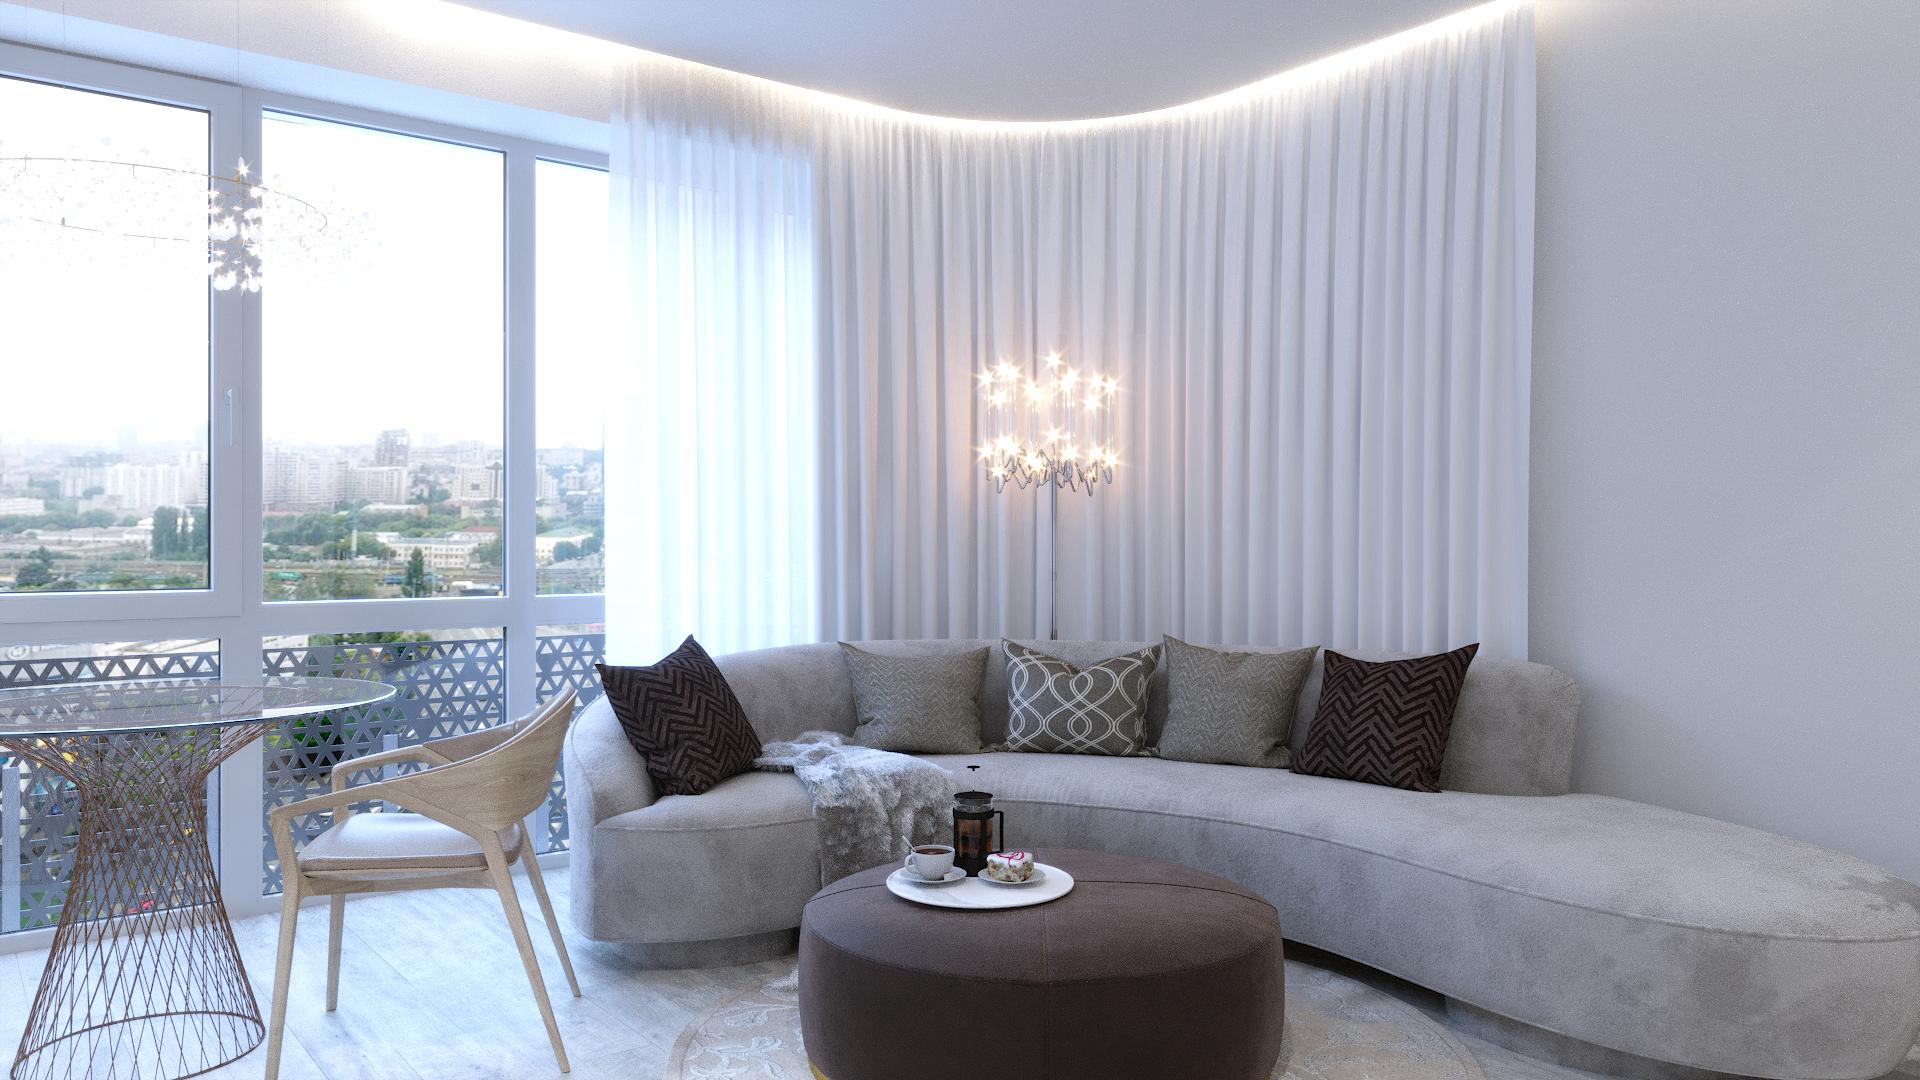 Белая квартира, 72 м2 | ст. м. Вокзальная | Слайд 3